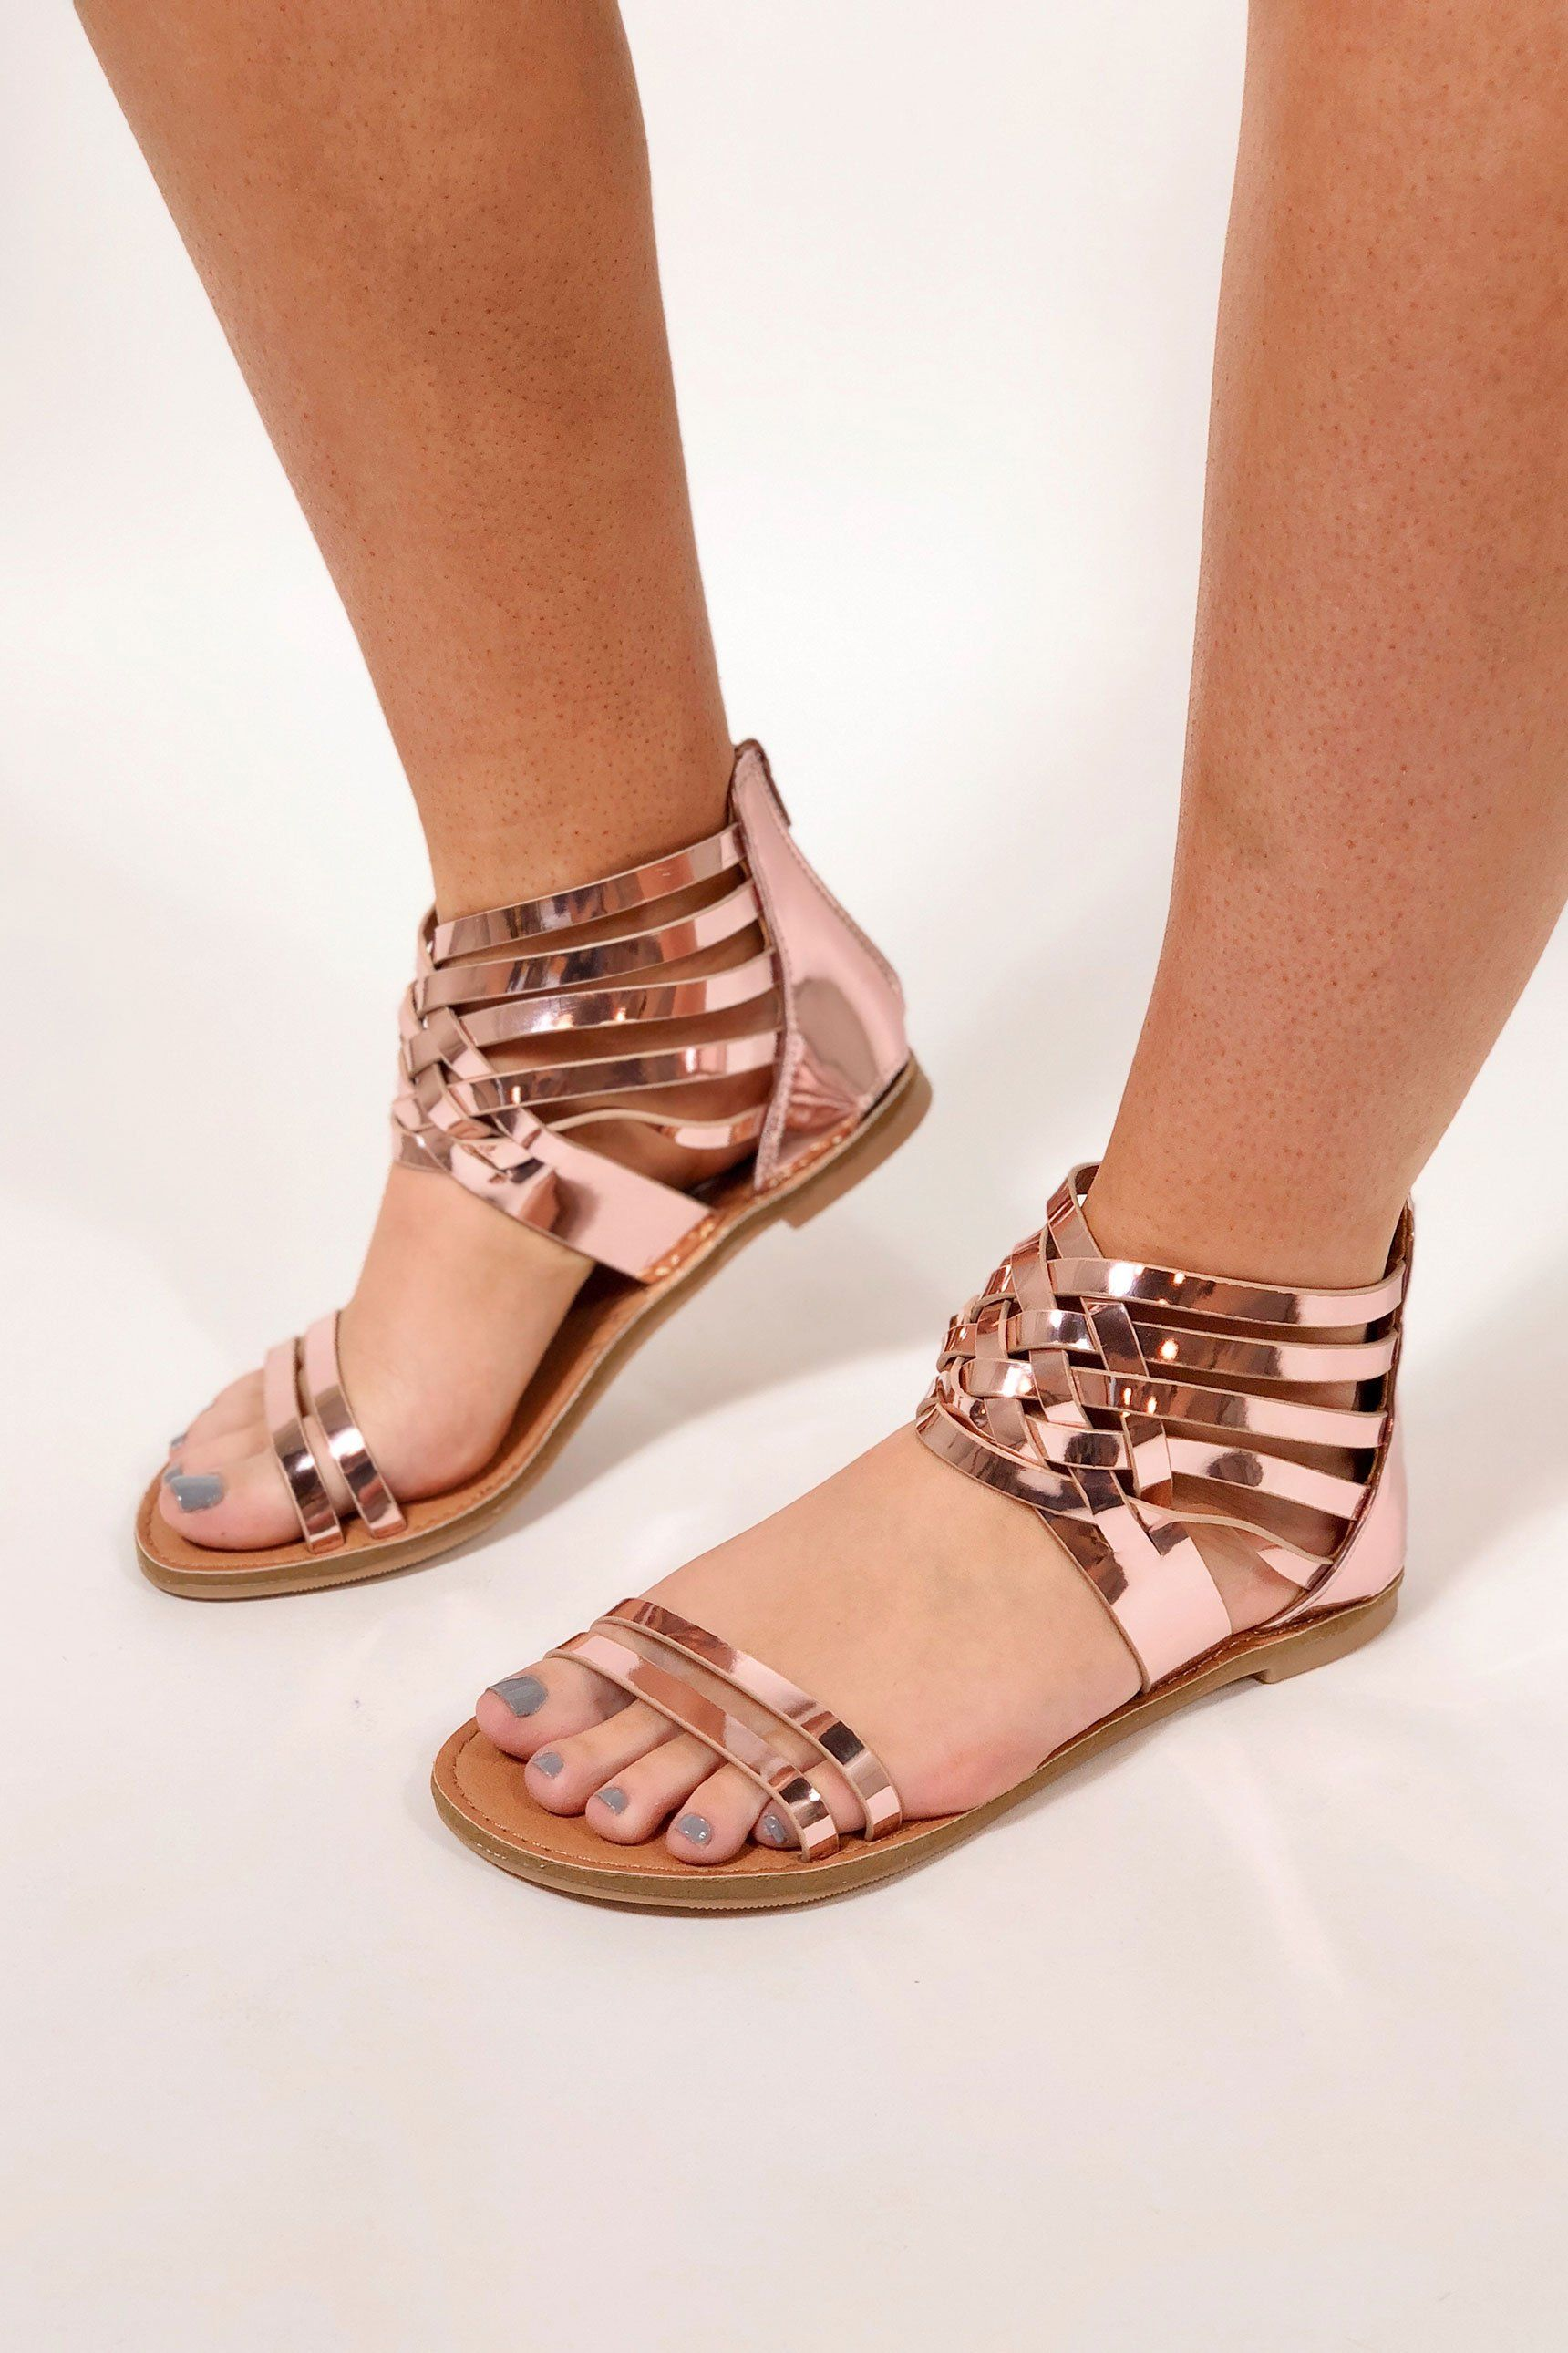 92ed683a945a Pin by ADEEBA❤ARCHEE on girls➖ballies n shoes girls footwear ...